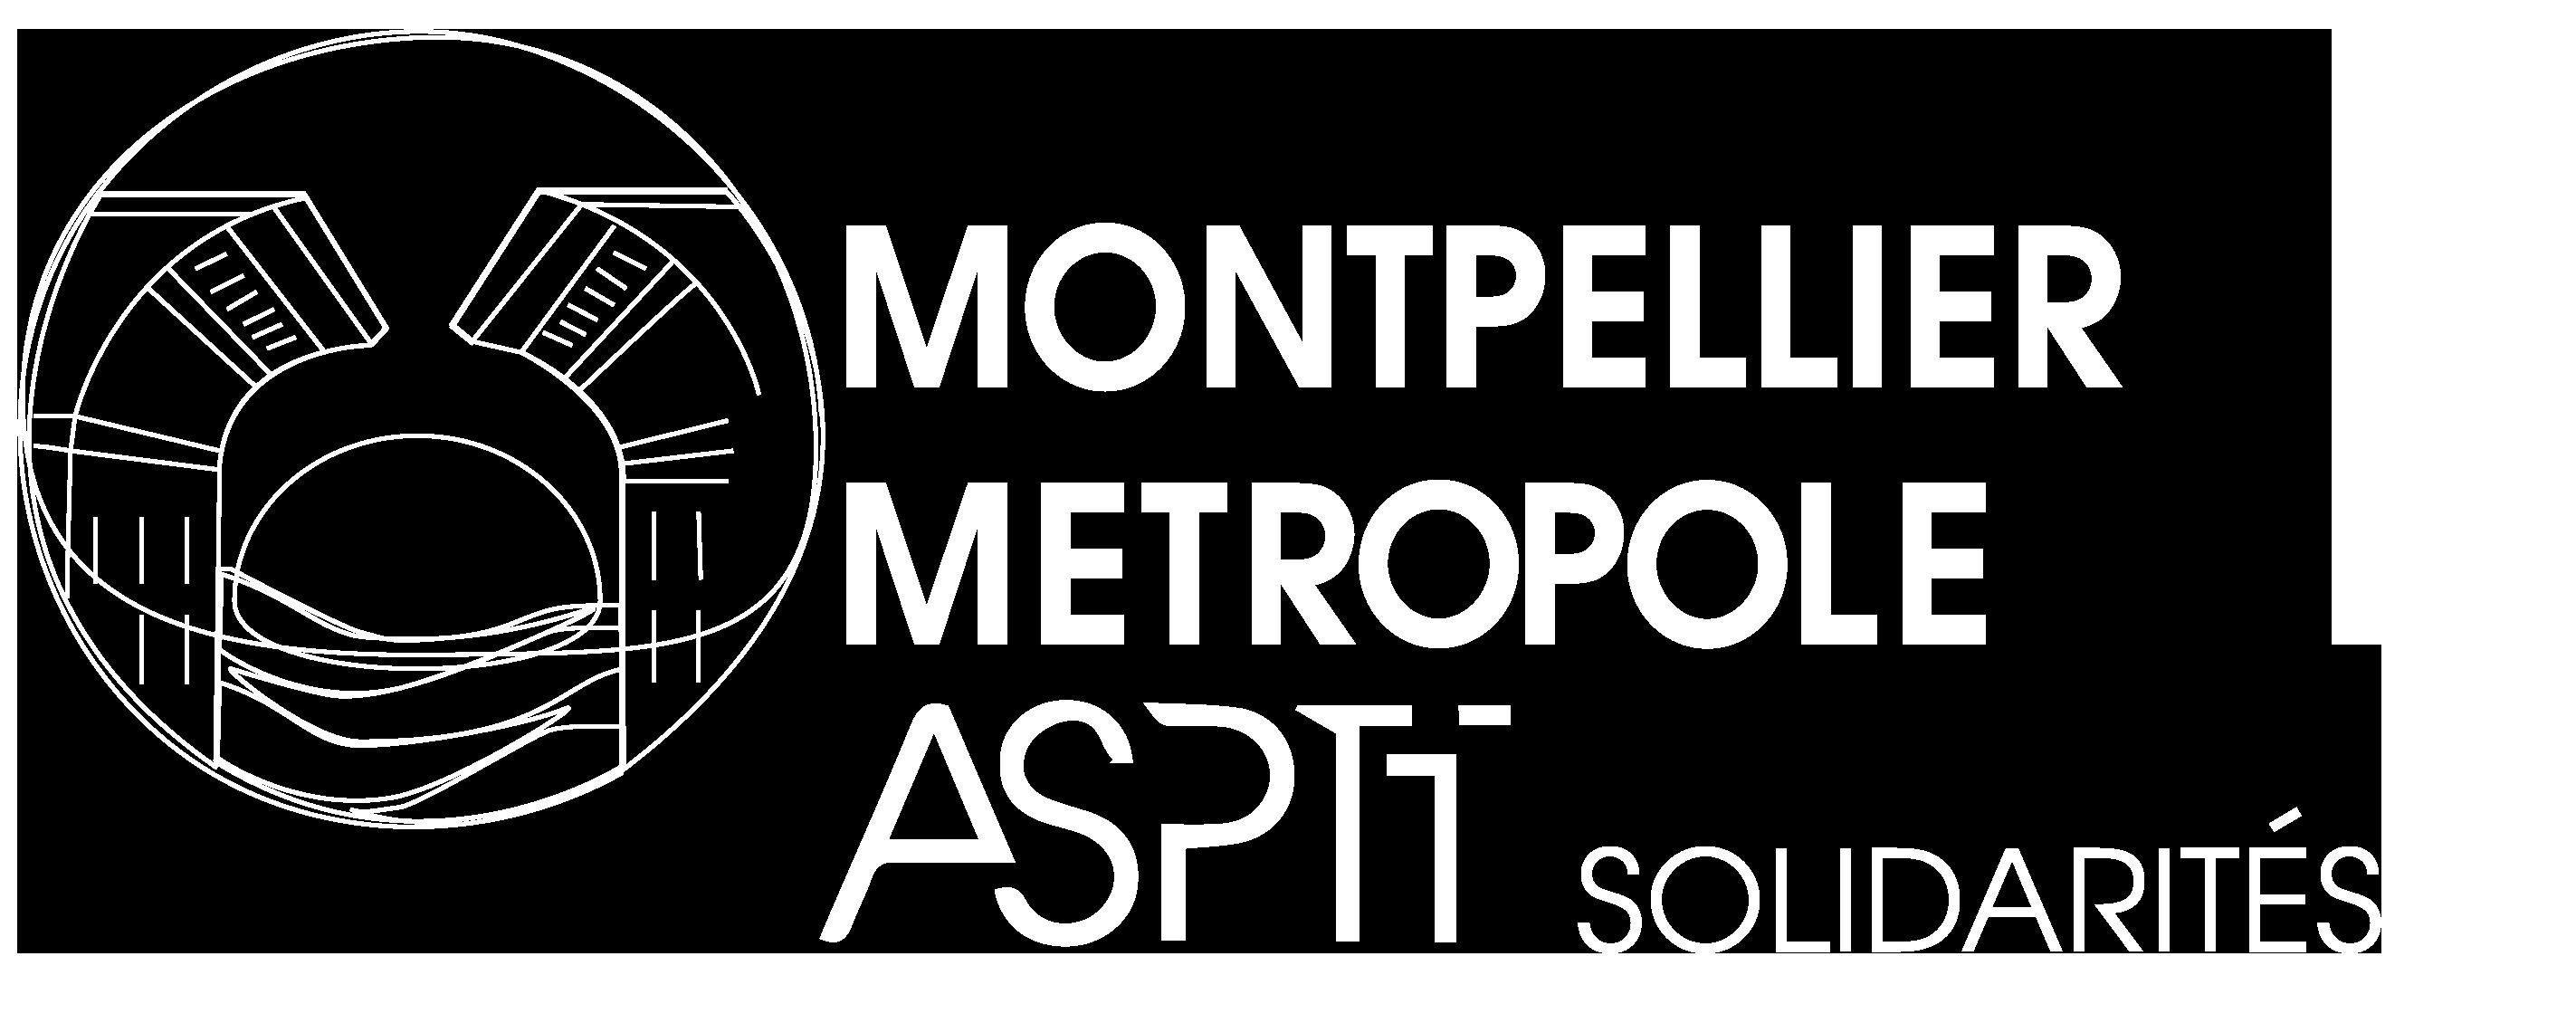 Montpellier Métropole ASPTT Solidarités